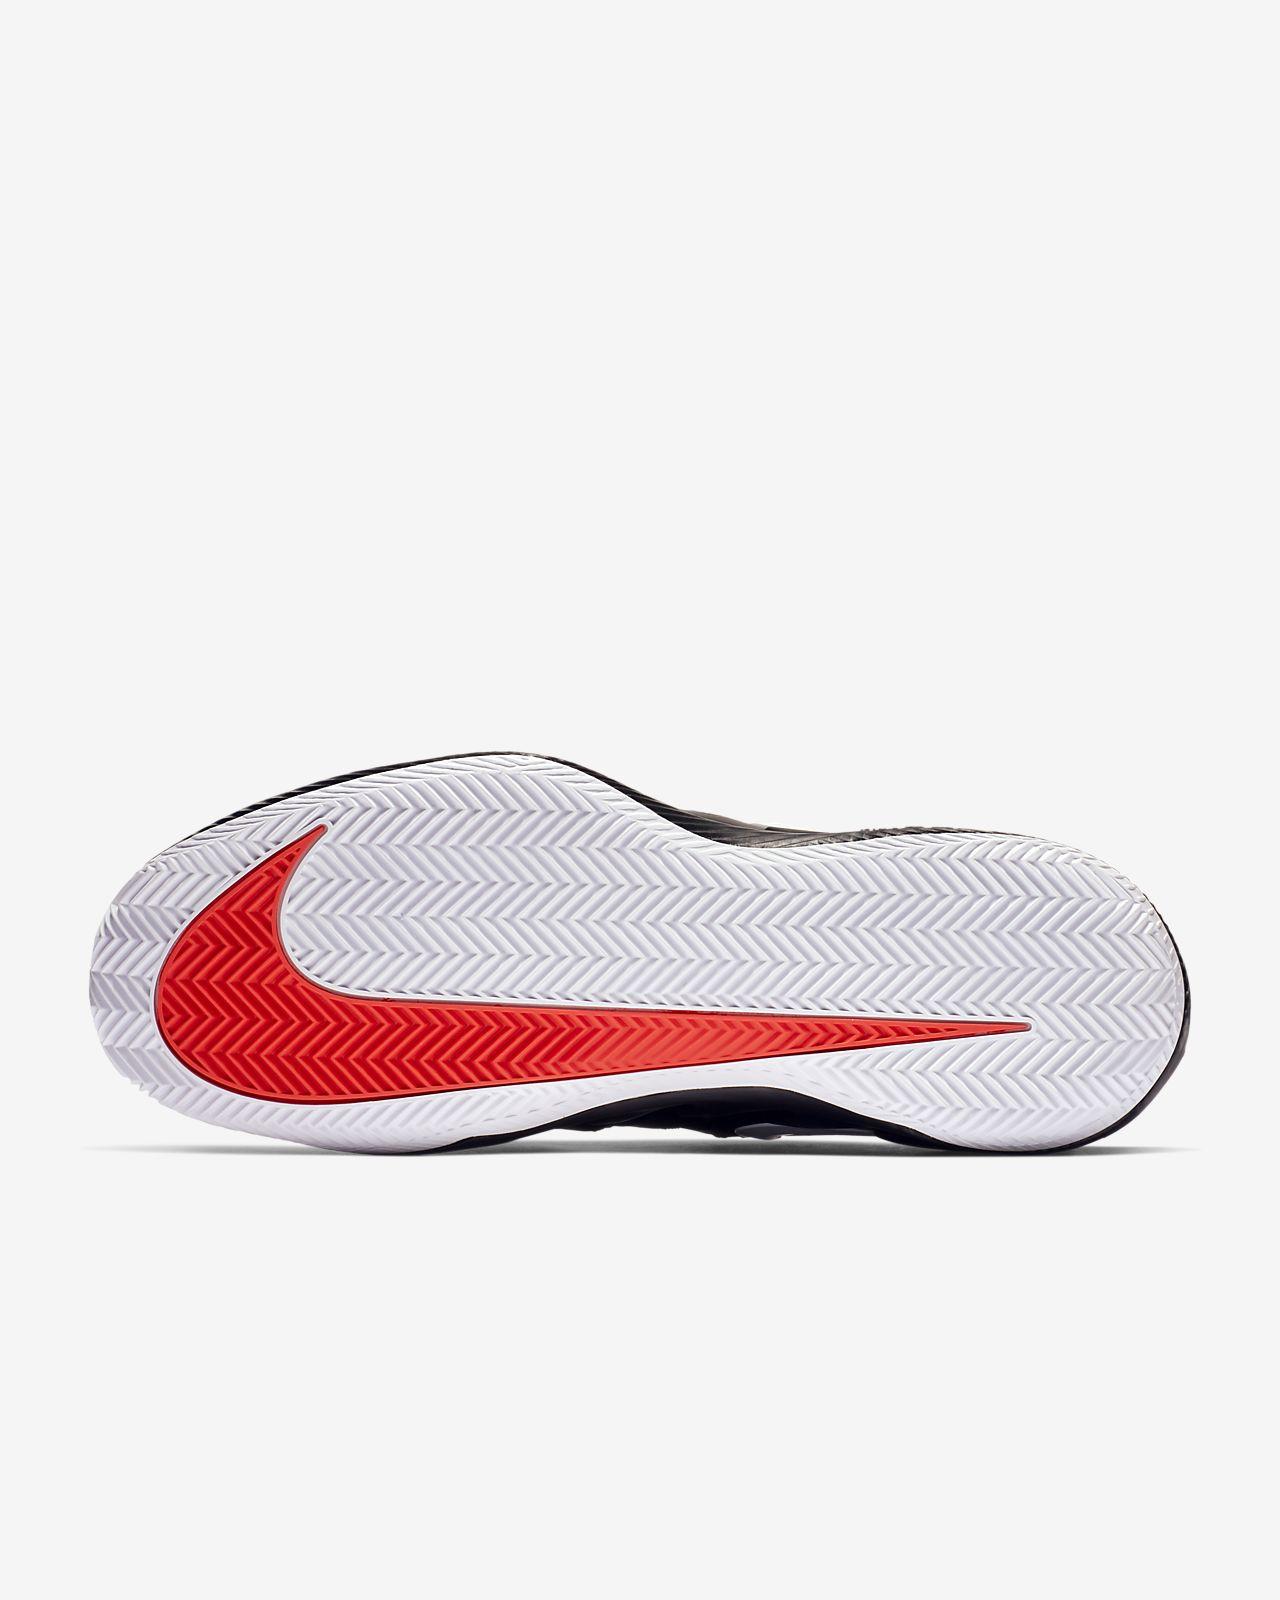 brand new 76137 4089e ... Chaussure de tennis Nike Air Zoom Vapor X Clay pour Homme